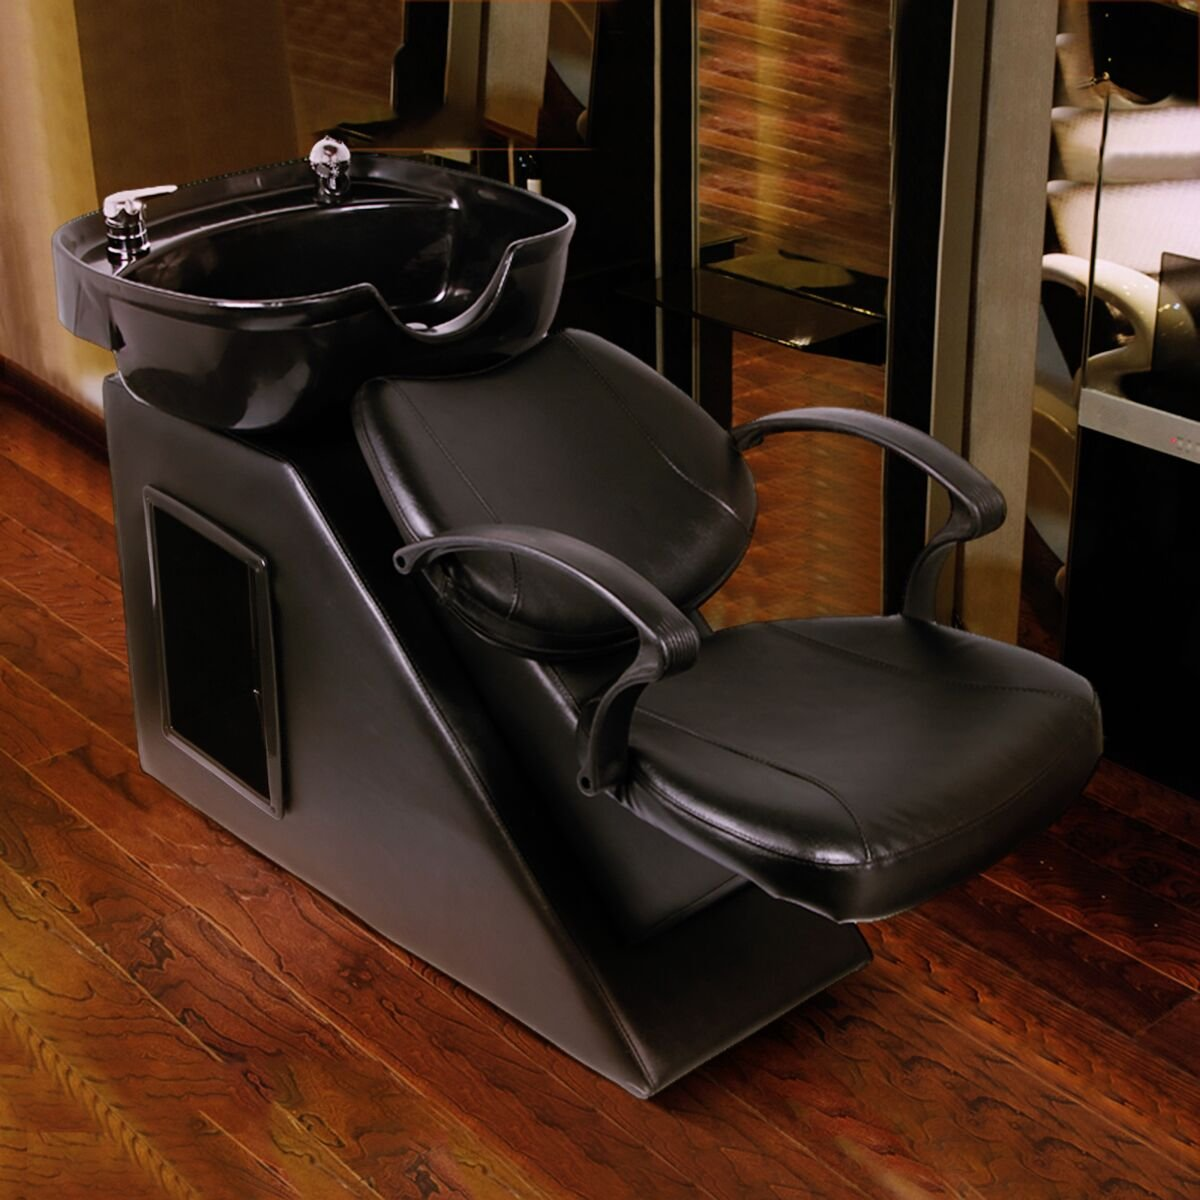 U-MAX Salon Backwash Bowl Shampoo Barber Chair Sink Spa Equipment Station Unit